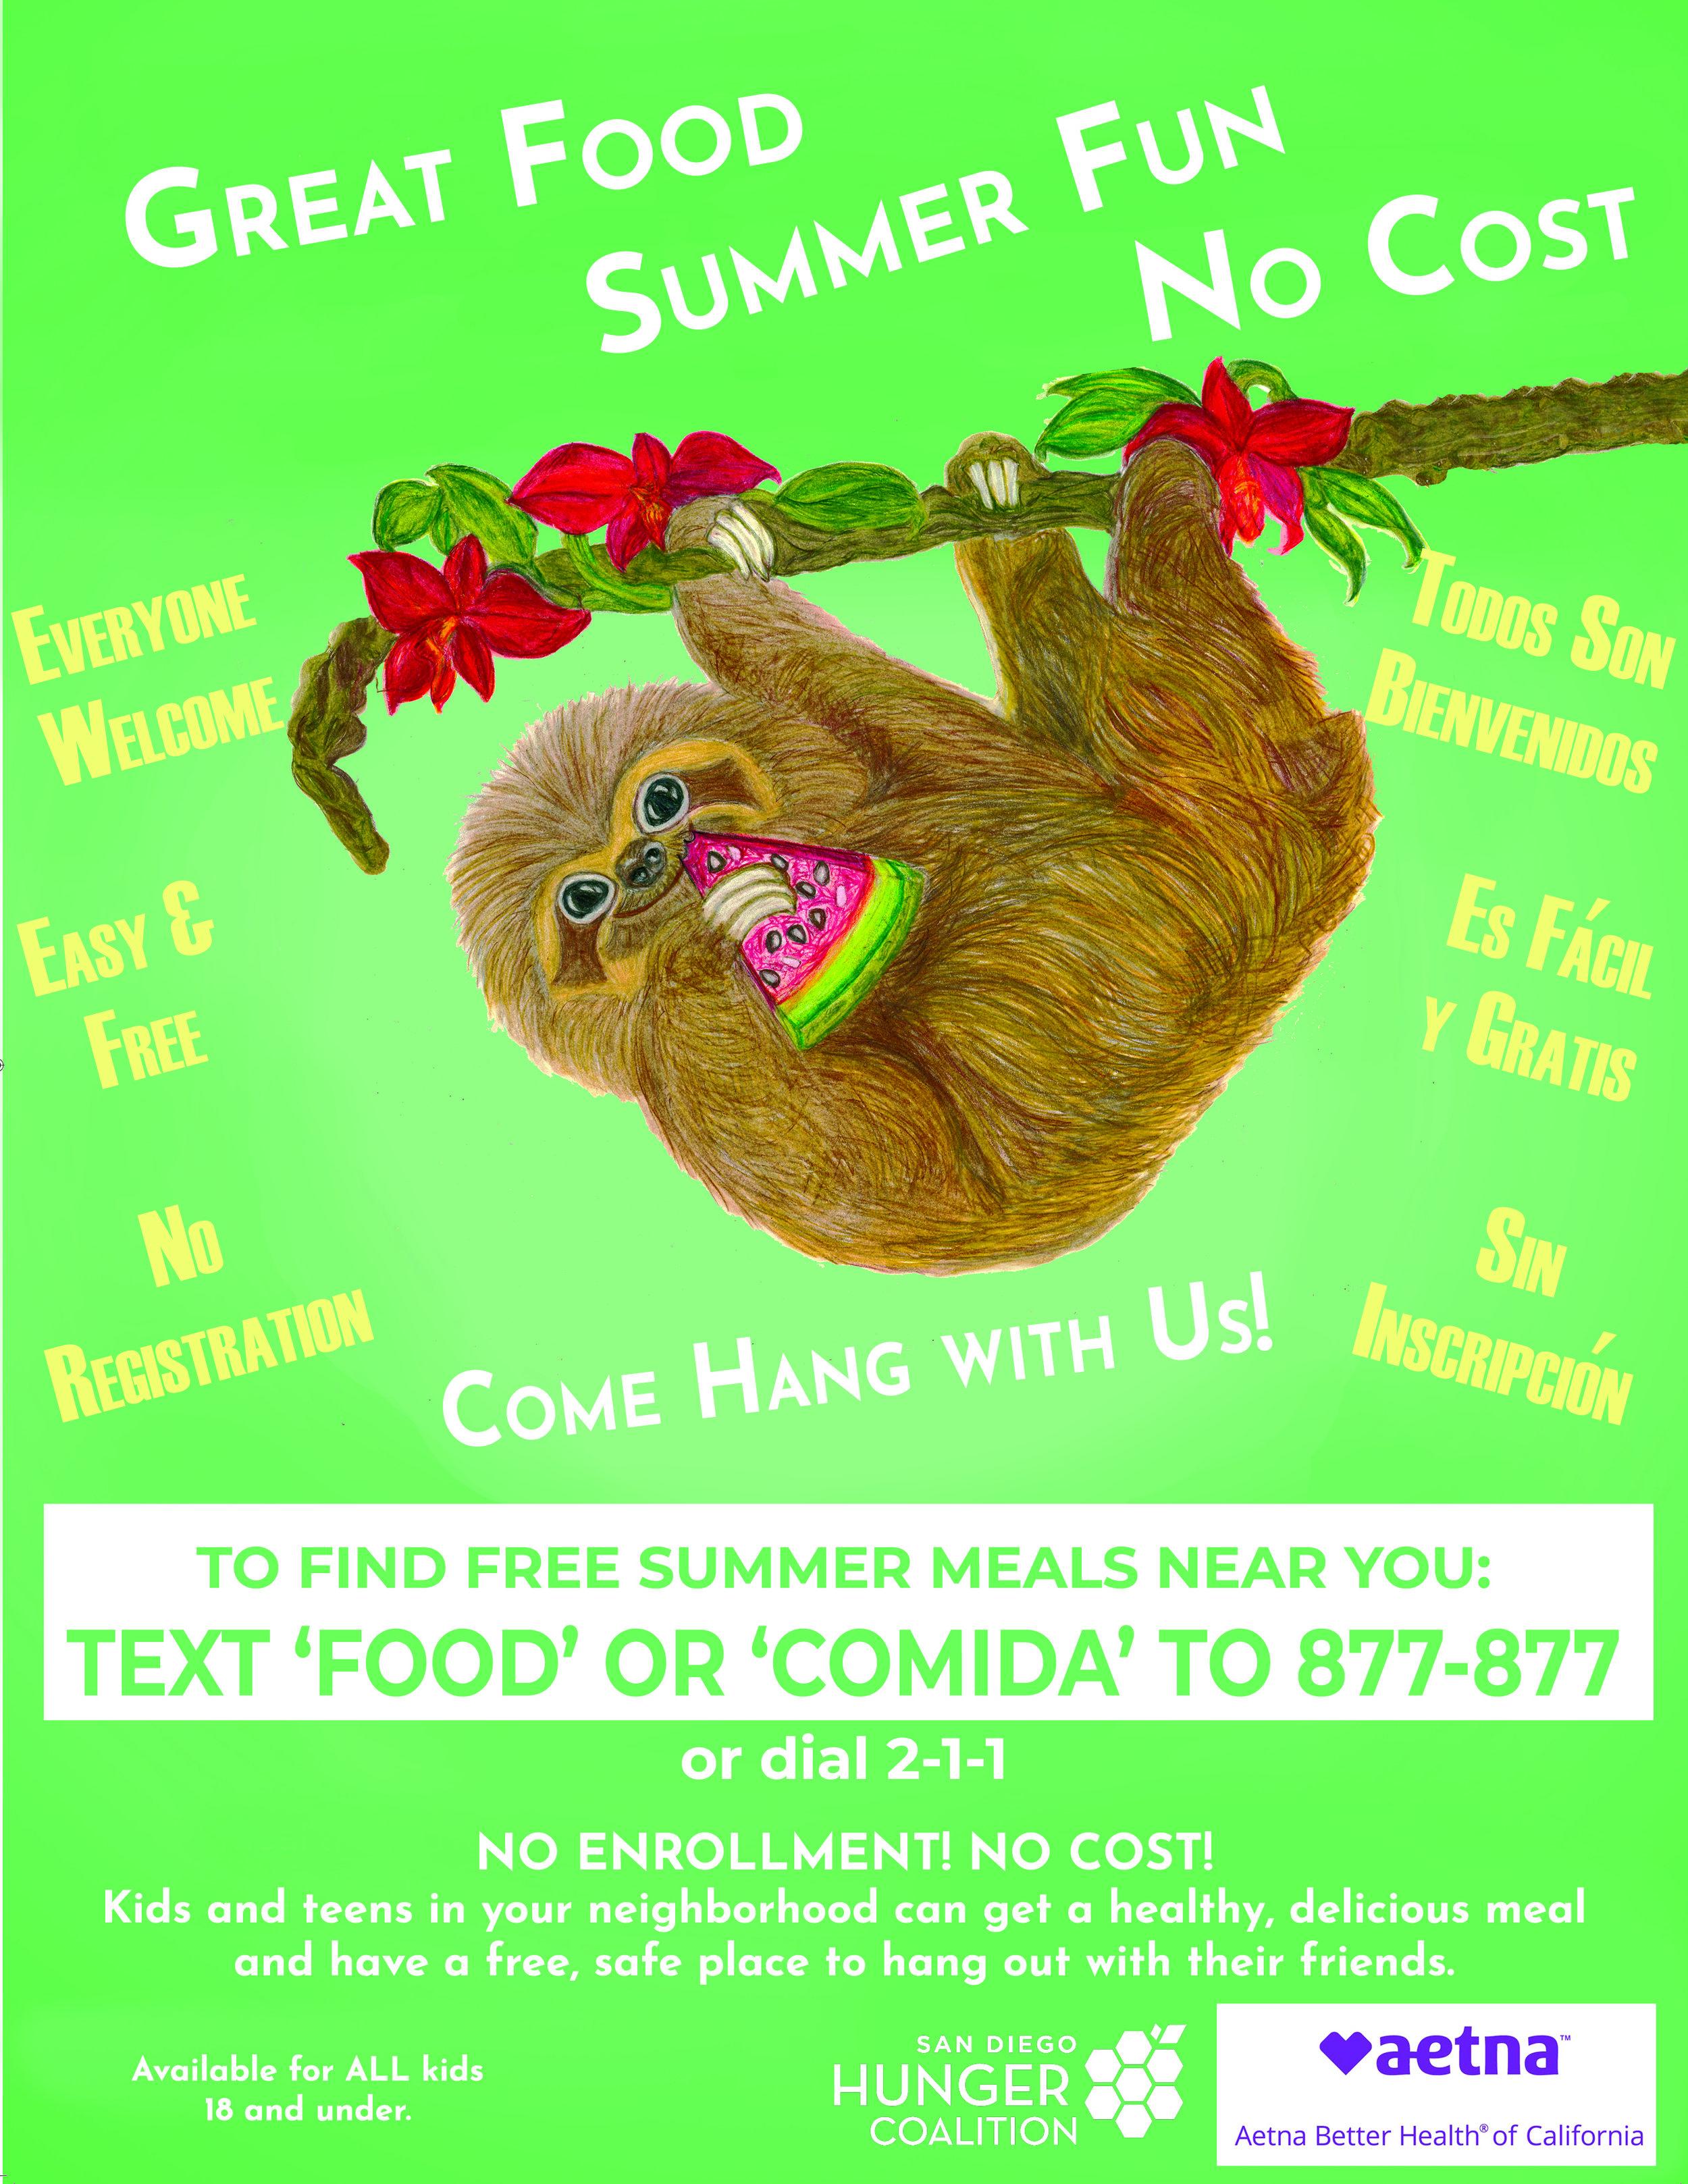 Summer meals front_sloth 20190530.jpg